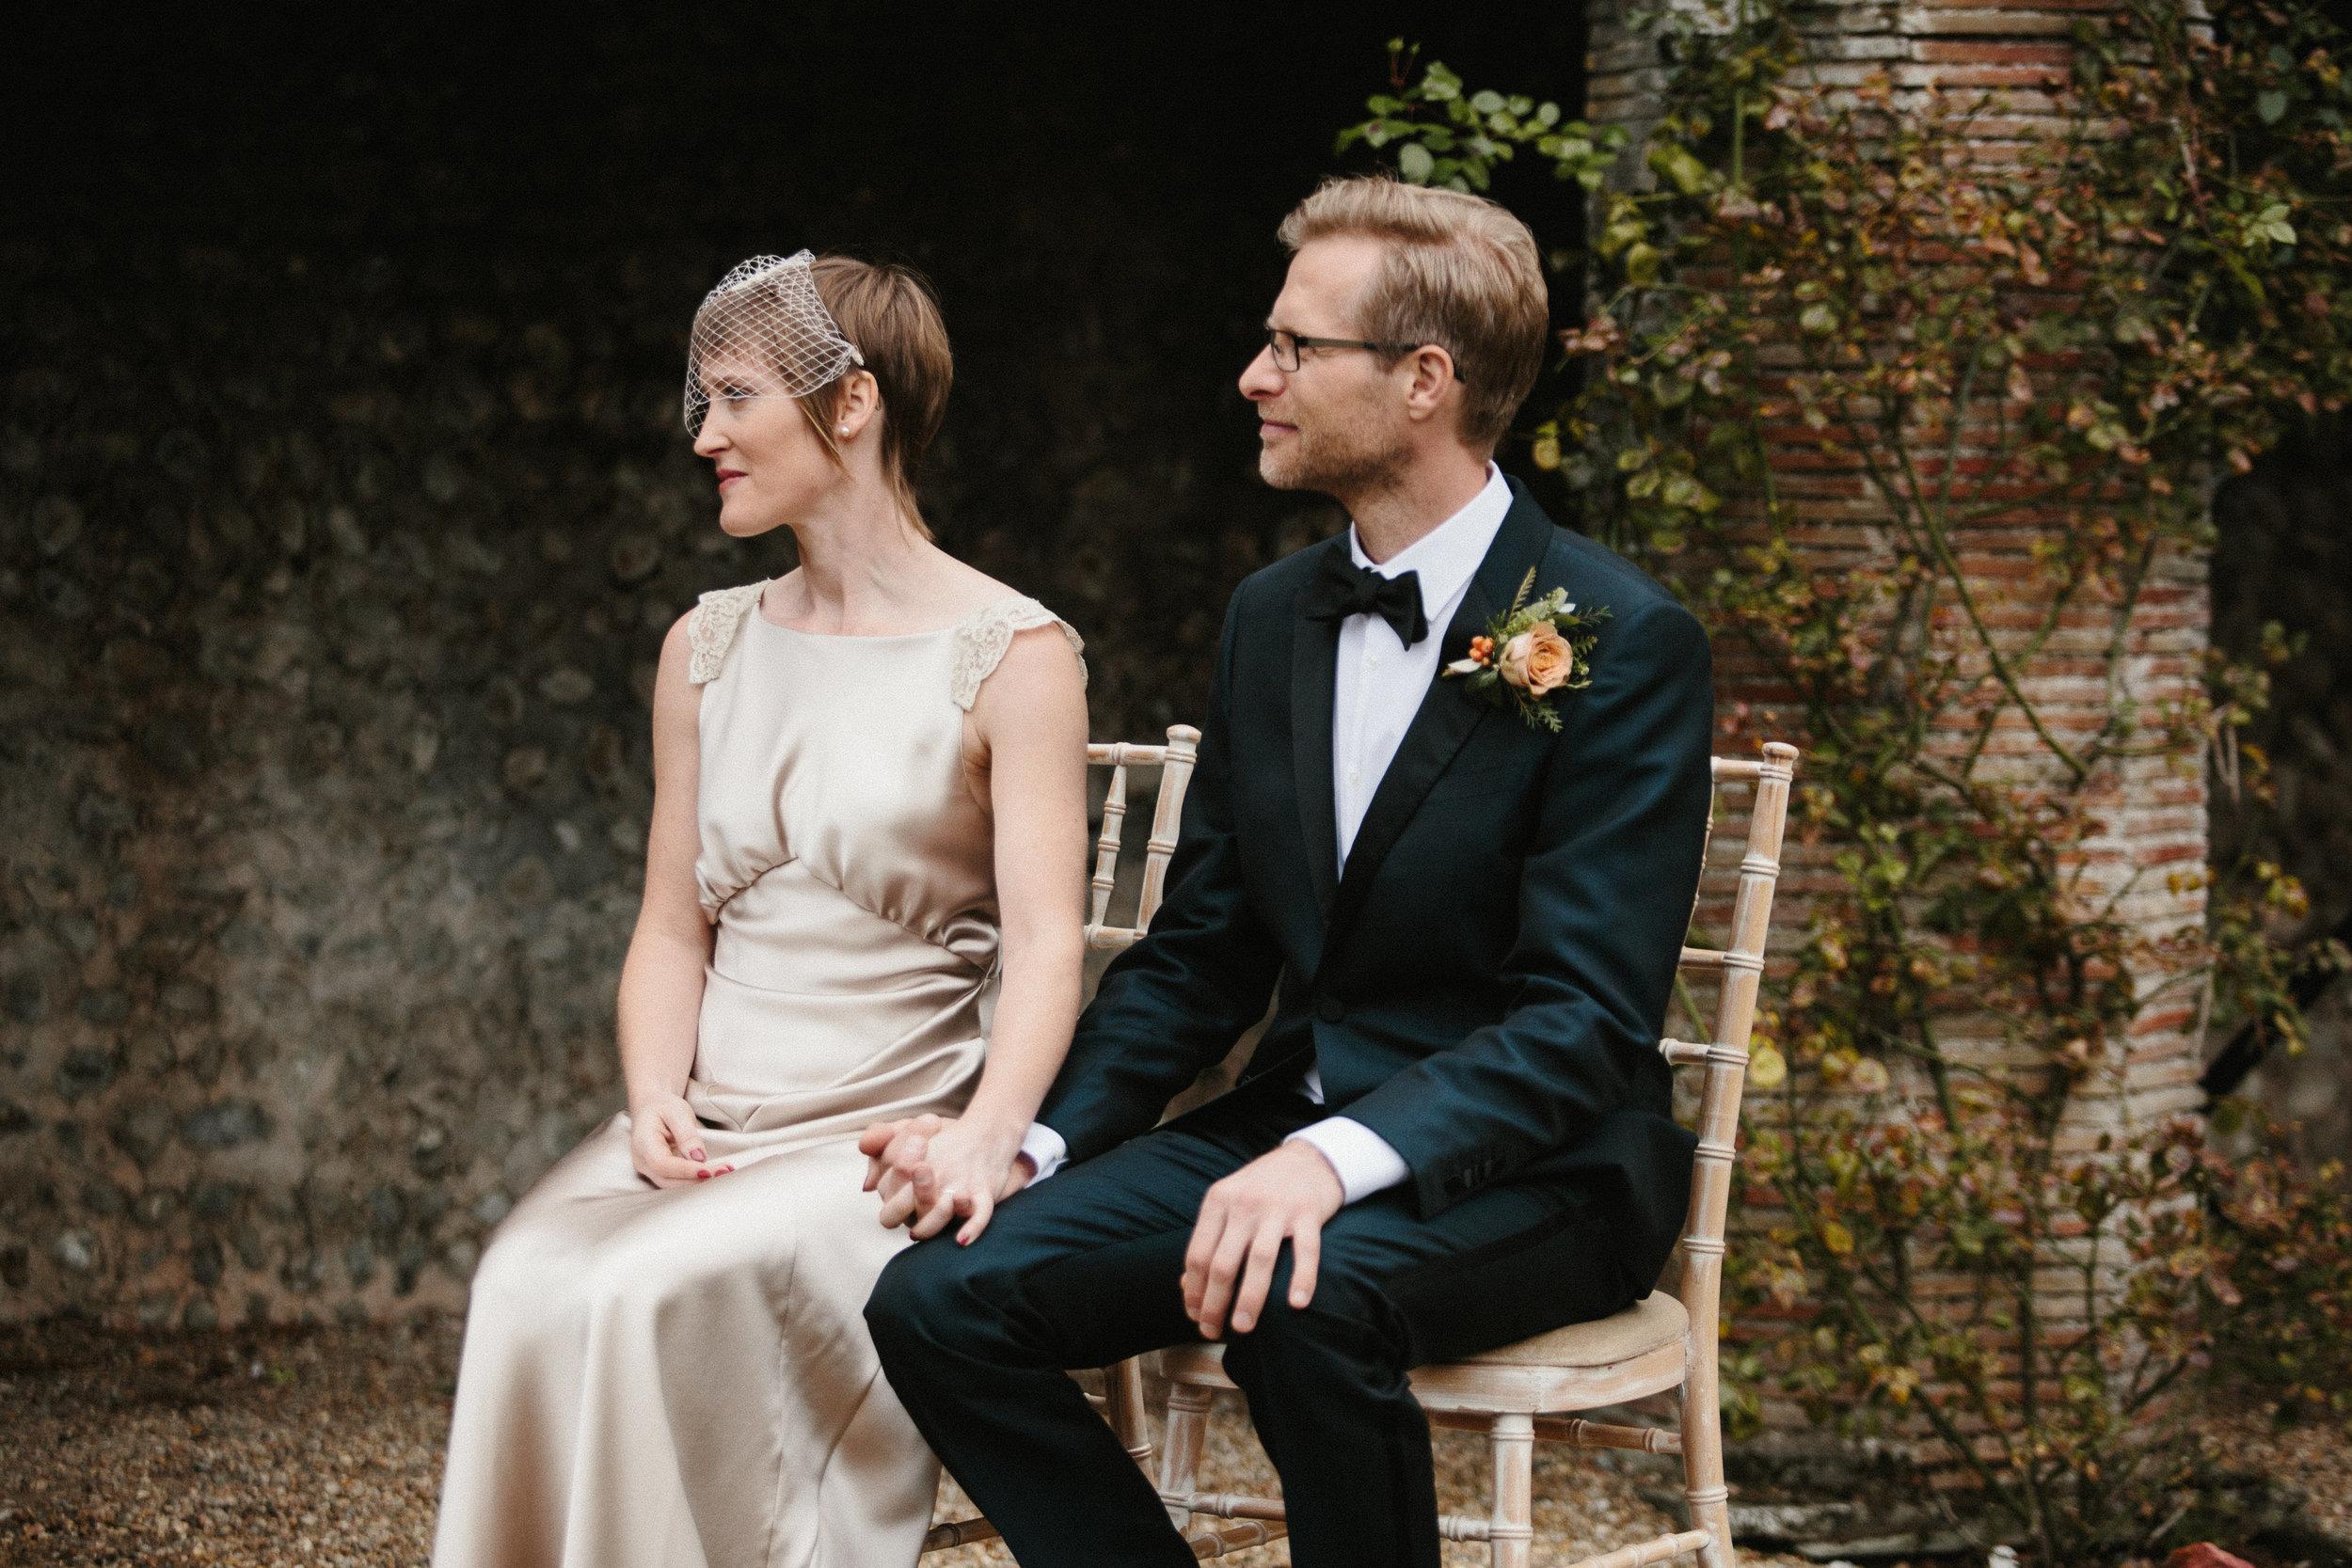 Kate-Beaumont-Sheffield-Honeysuckle-bias-cut-wedding-dress-oyster-Rosie9.jpg